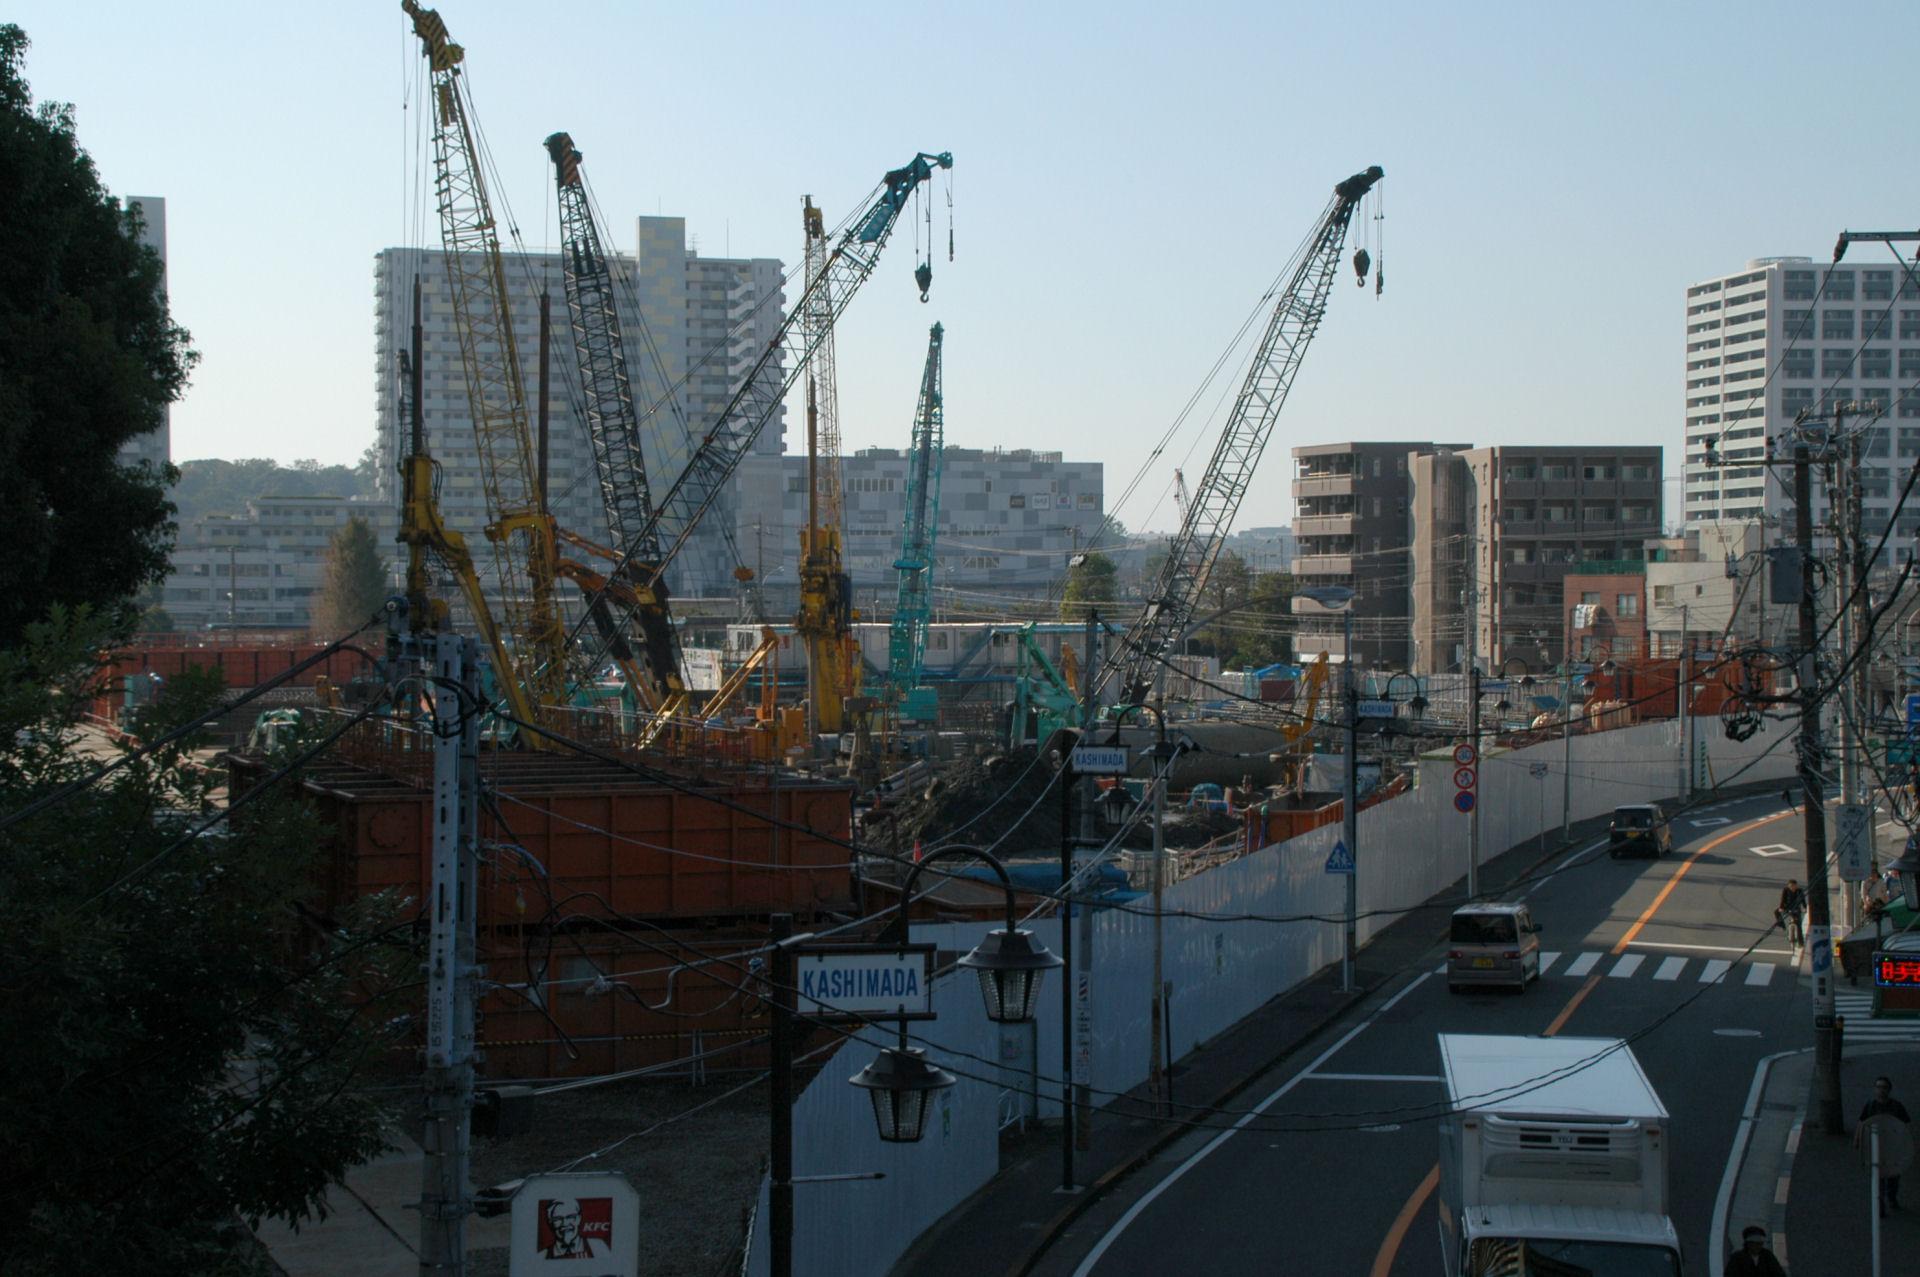 kajimada0159.jpg